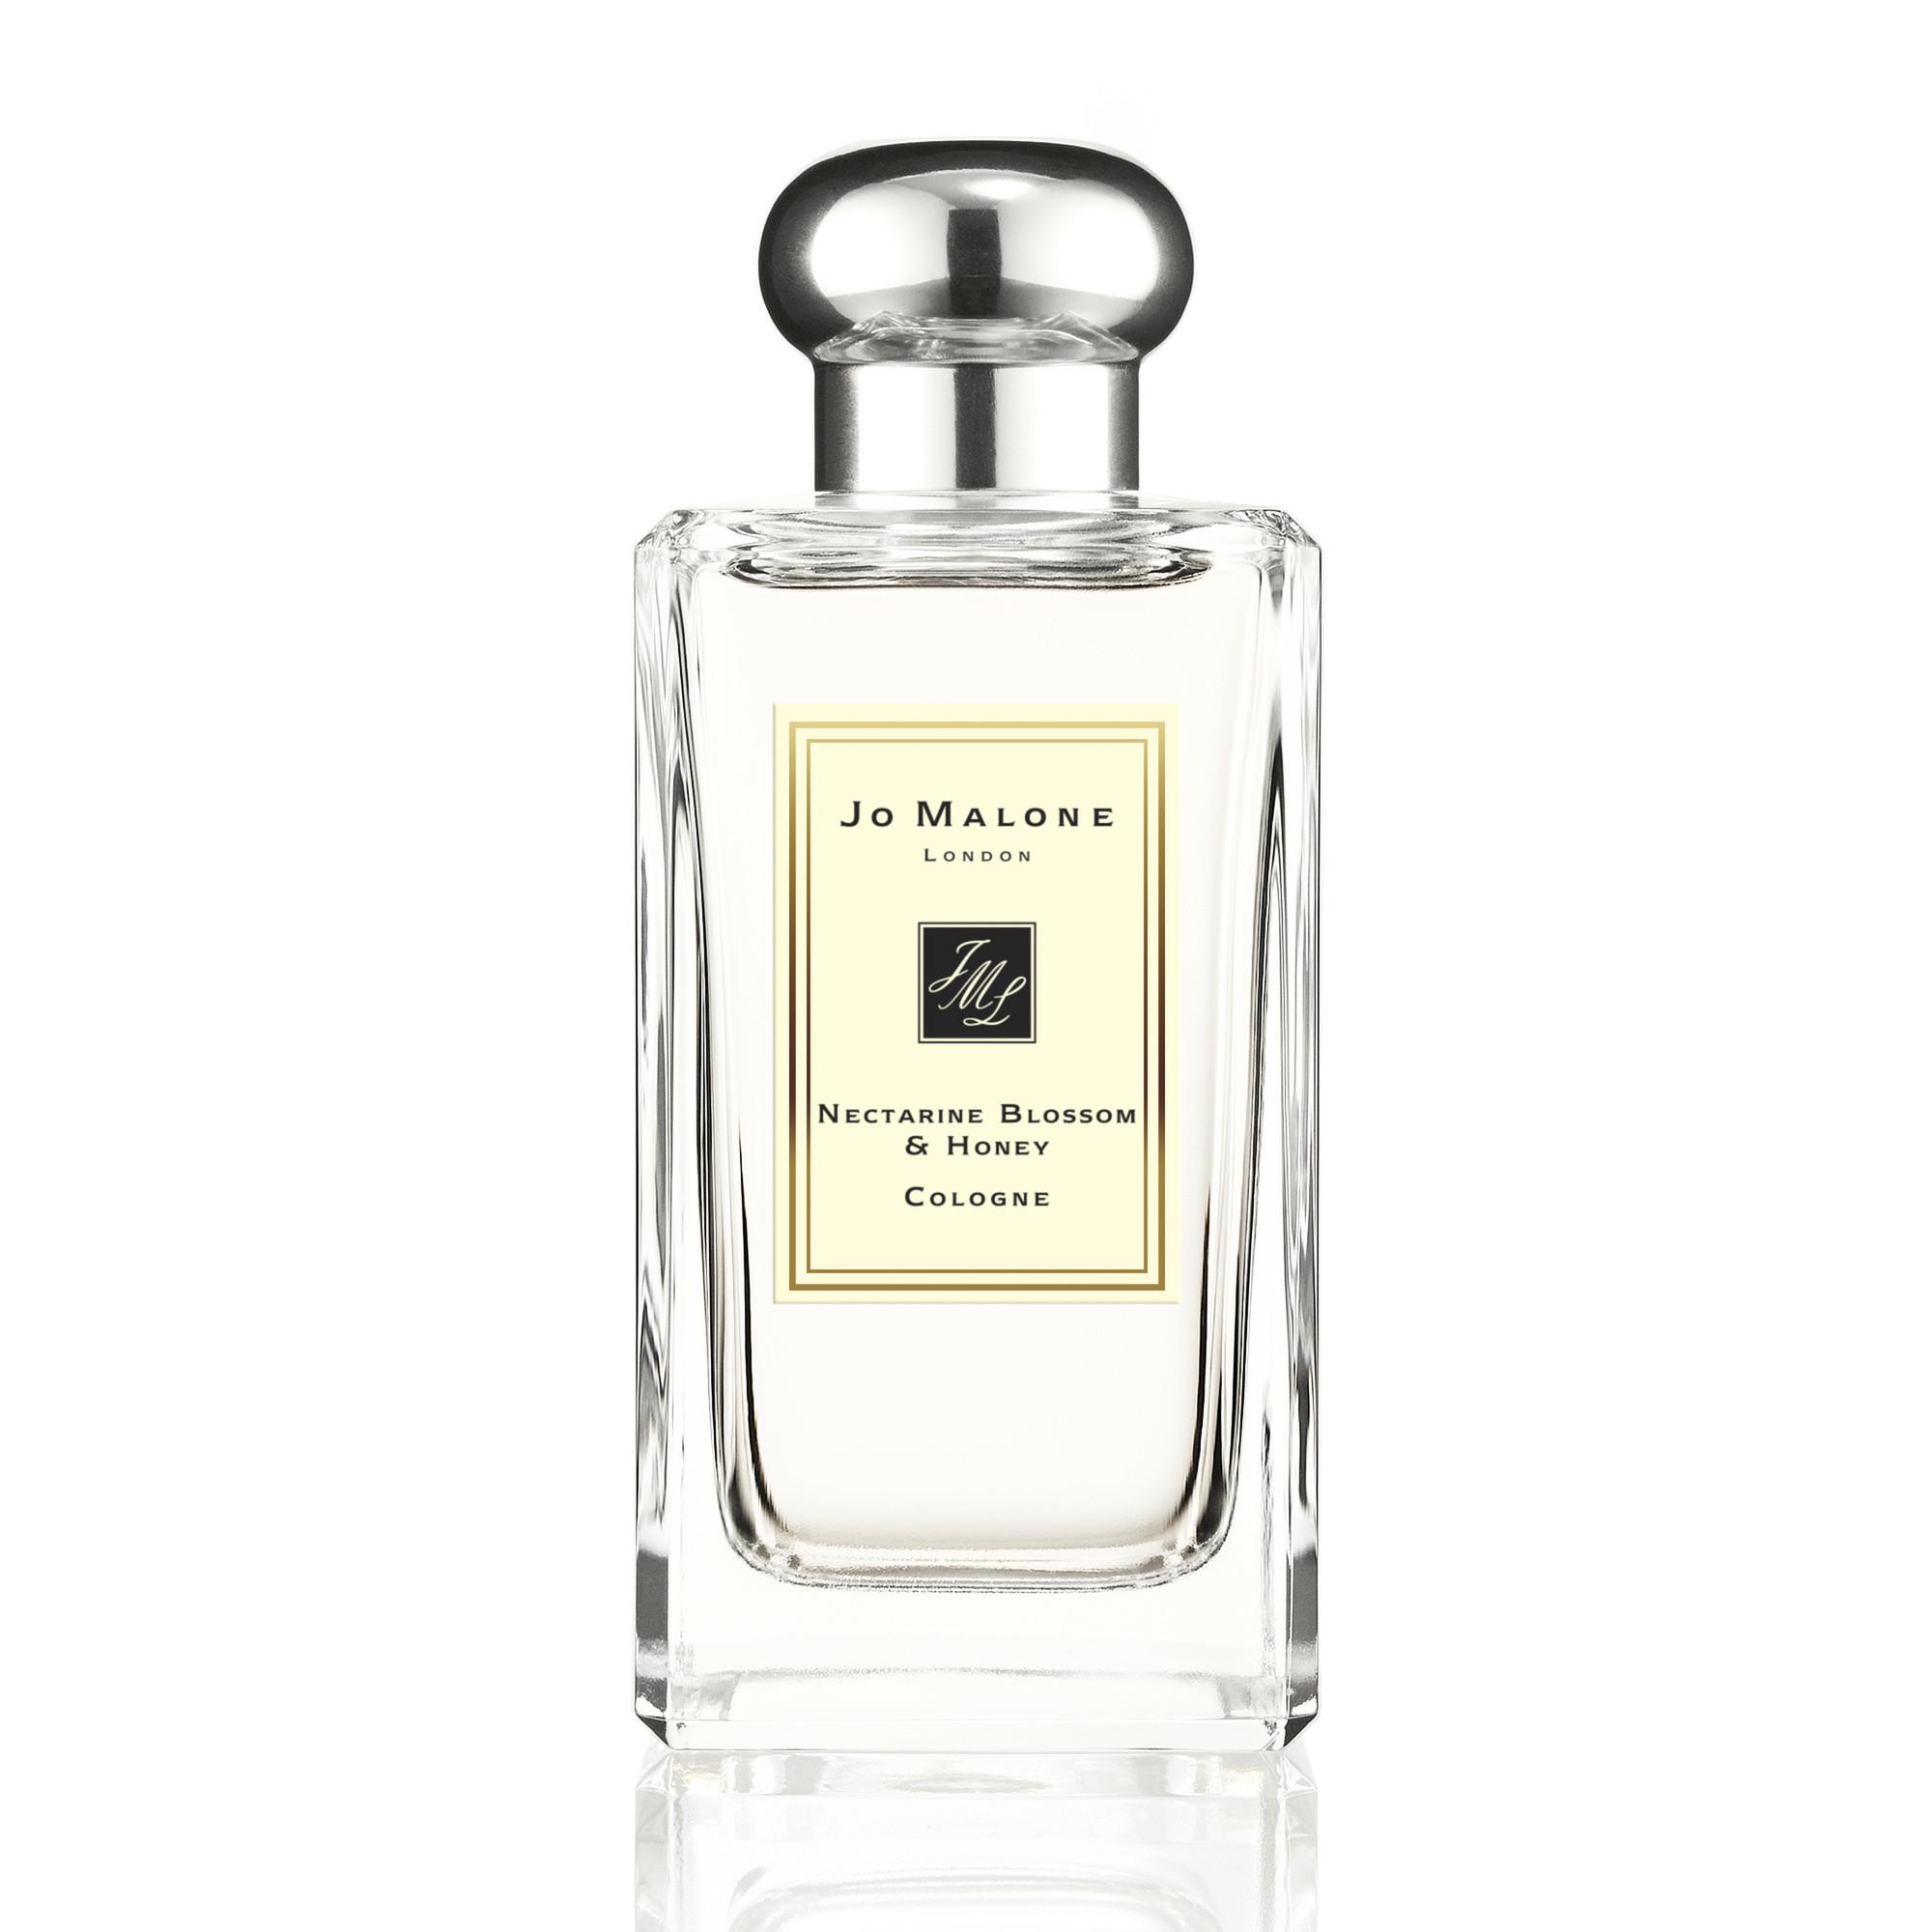 Jo Malone London nectarine blossom & honey cologne 100 ml, Beige, large image number 0